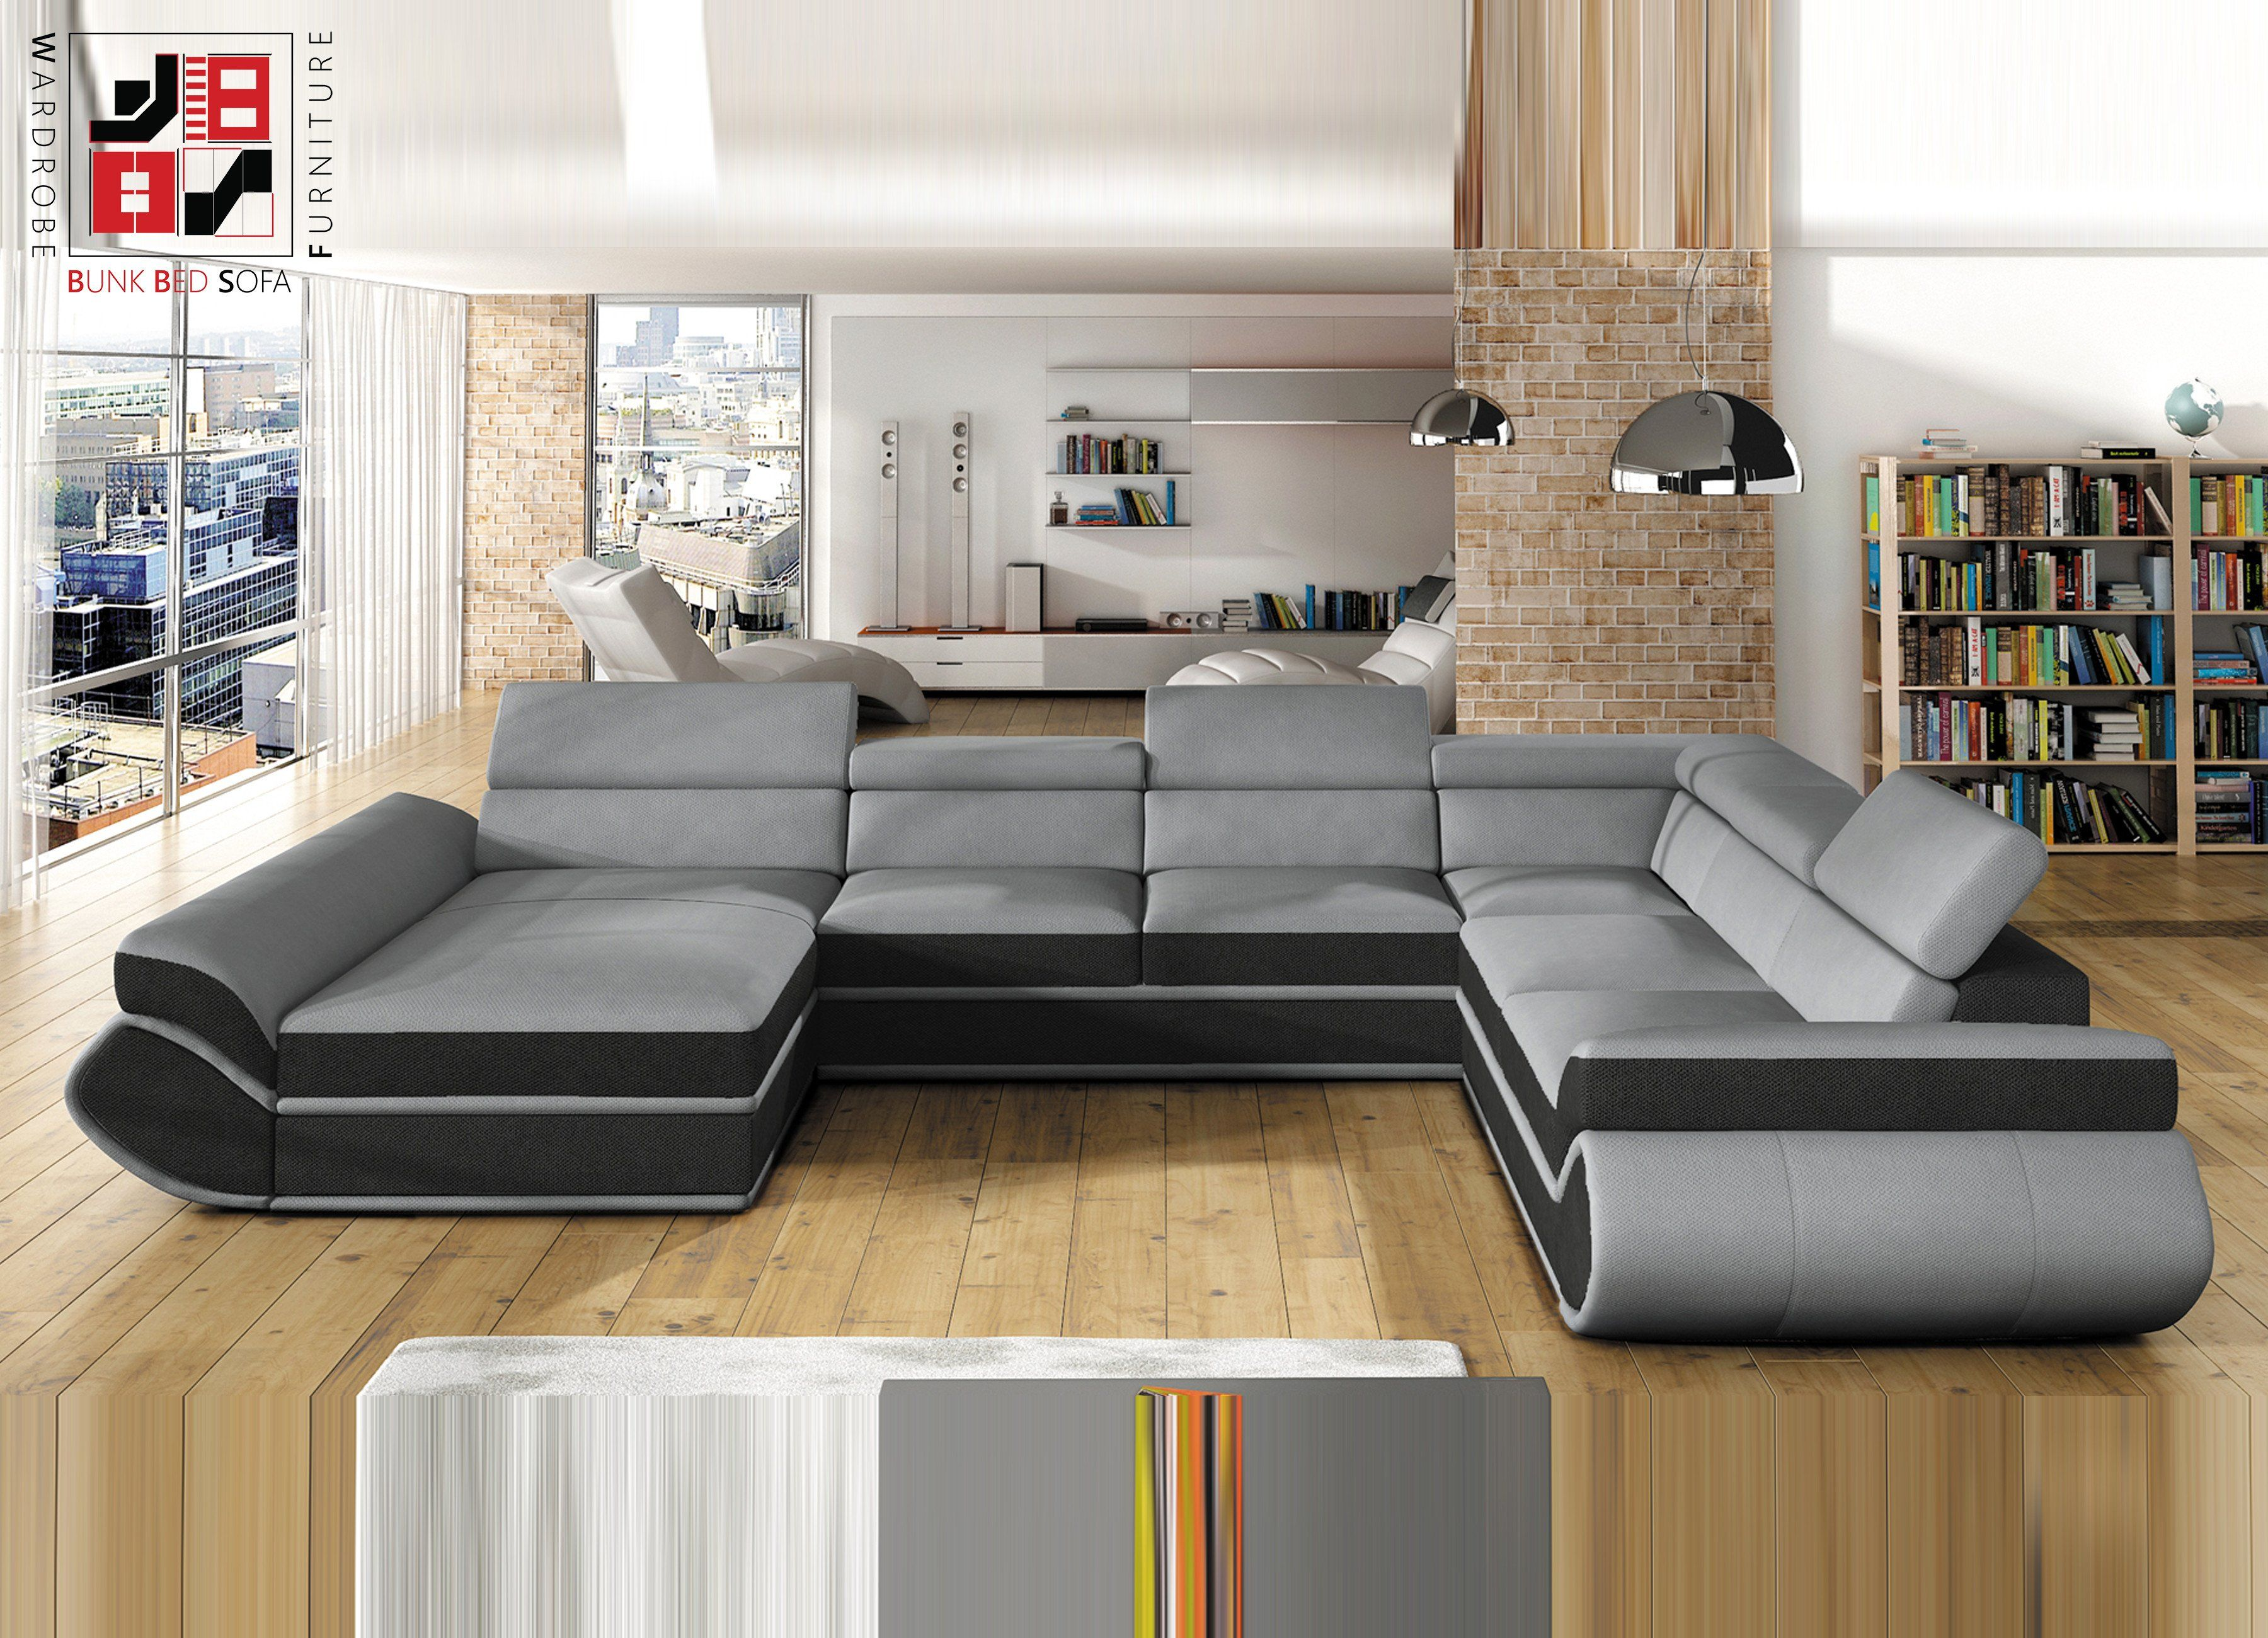 Universe Xl Luxury U Shape Sofa Bed For Extra Ordinary Folkes 374x287x190cm U Shaped Sofa Bed U Shaped Sofa Sectional Sleeper Sofa